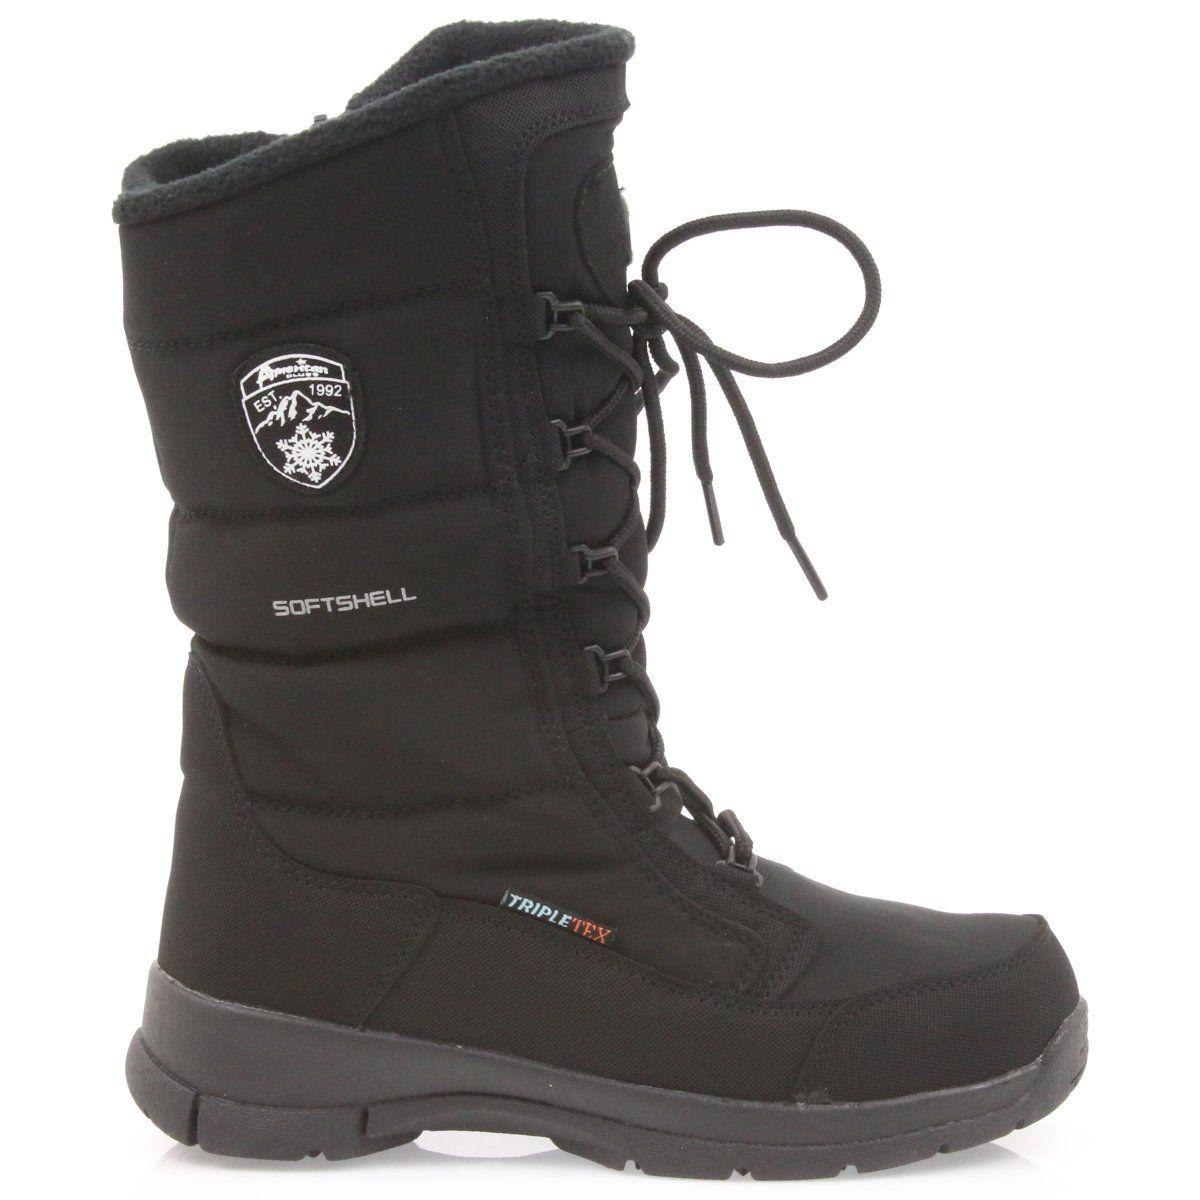 American Club Kozaki Softshell Z Membrana American Sn12 20 Czarne Boots Softshell Winter Boot